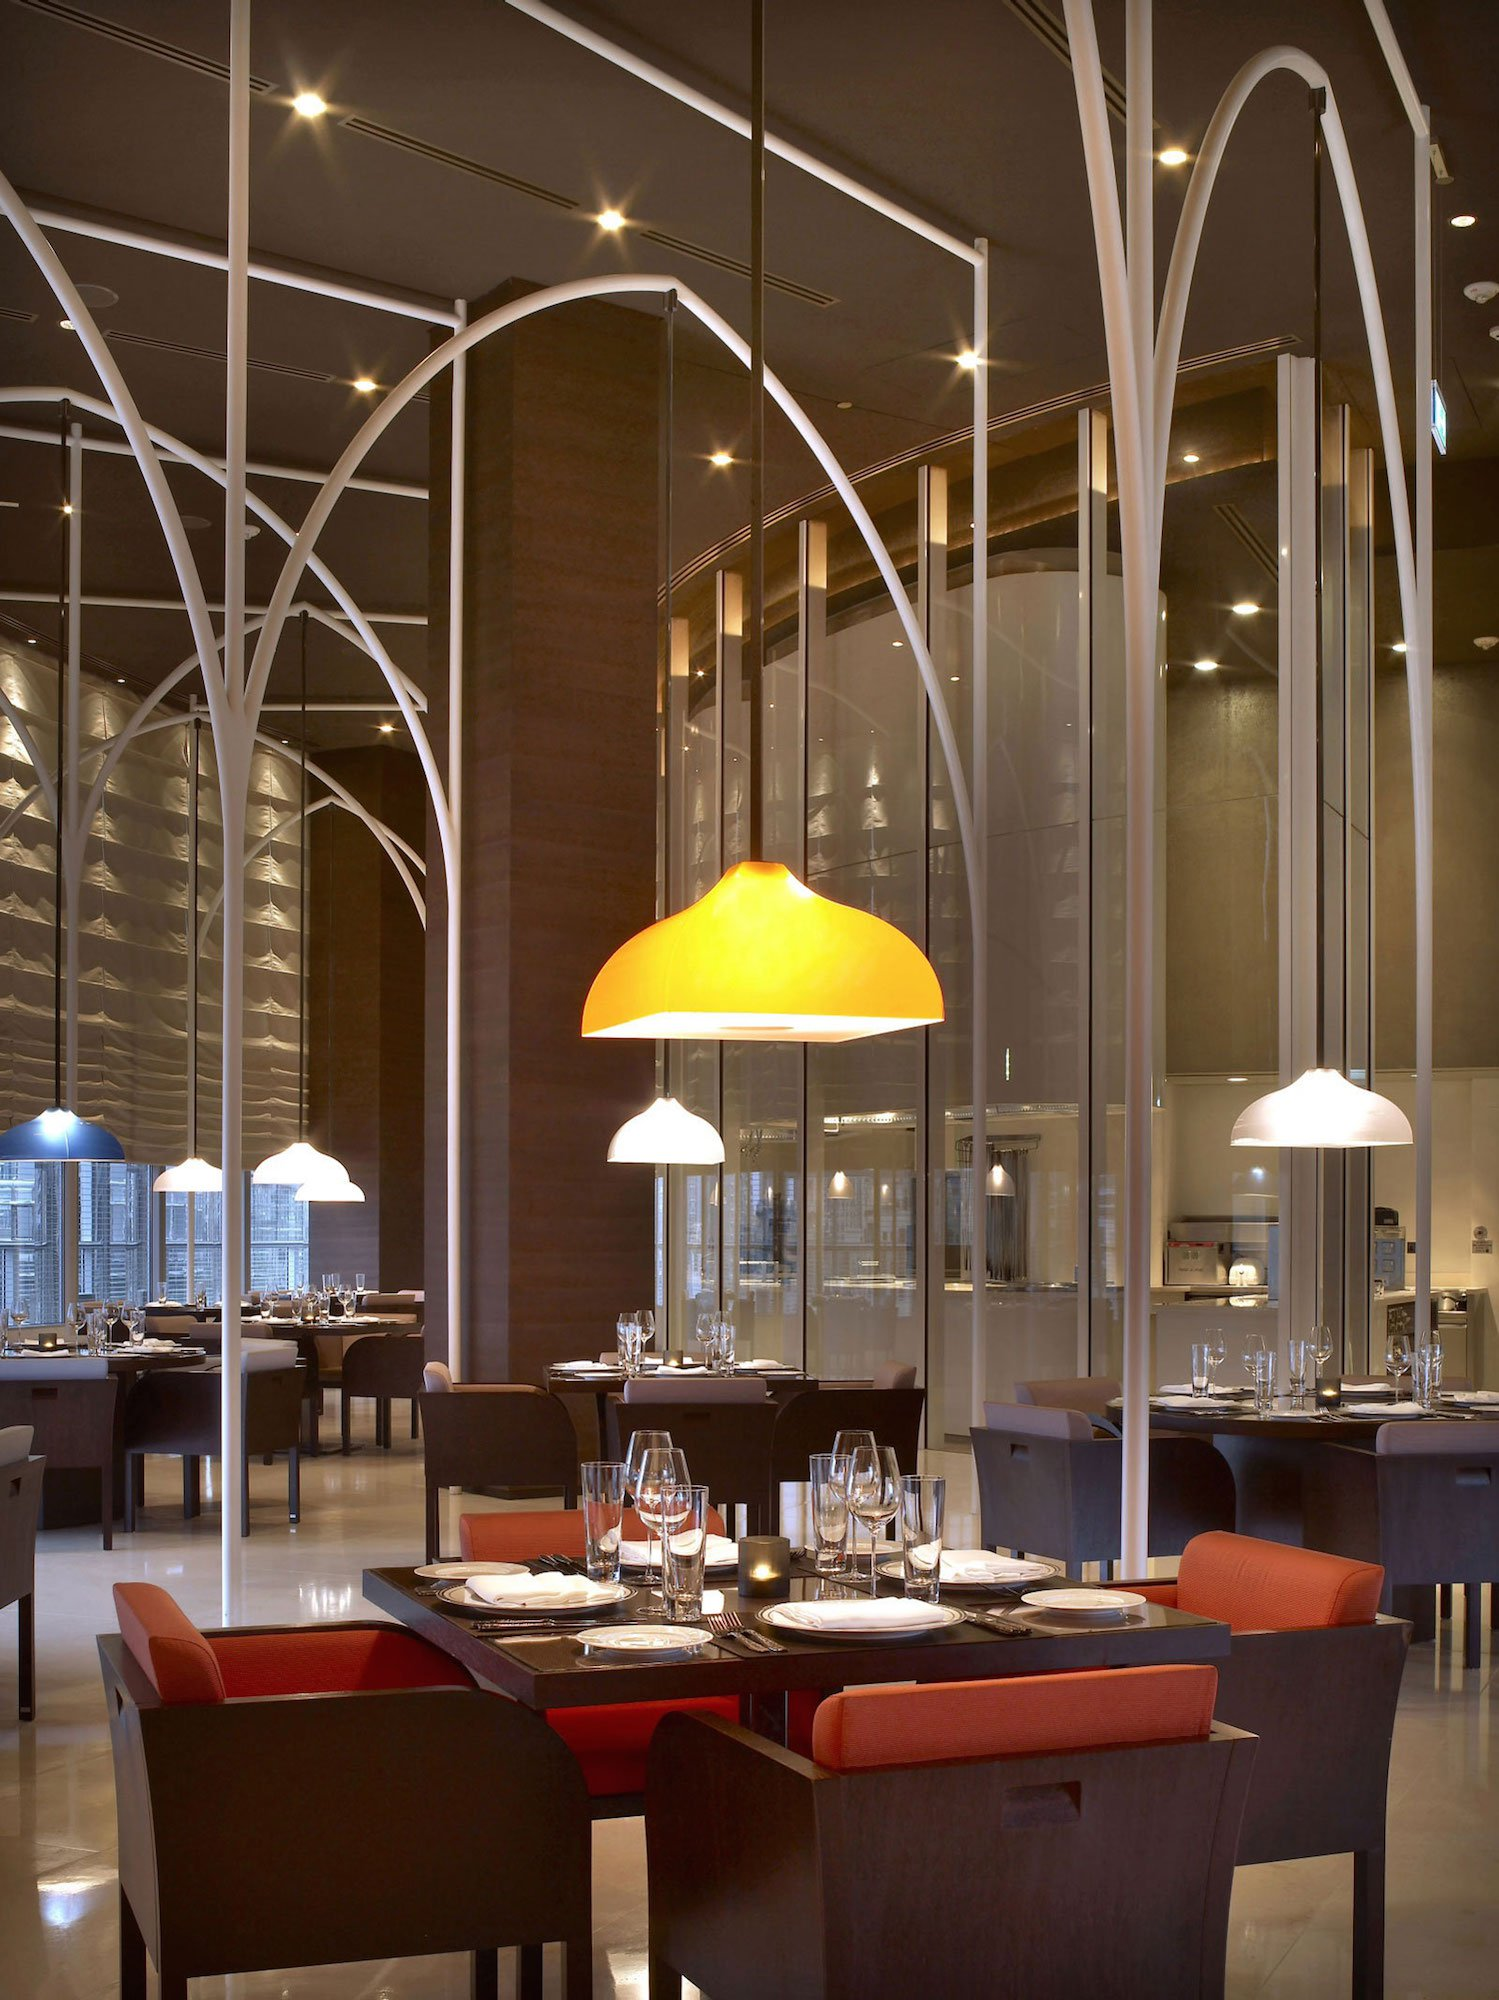 Armani hotel dubai by wilson associates caandesign for Design hotel dubai